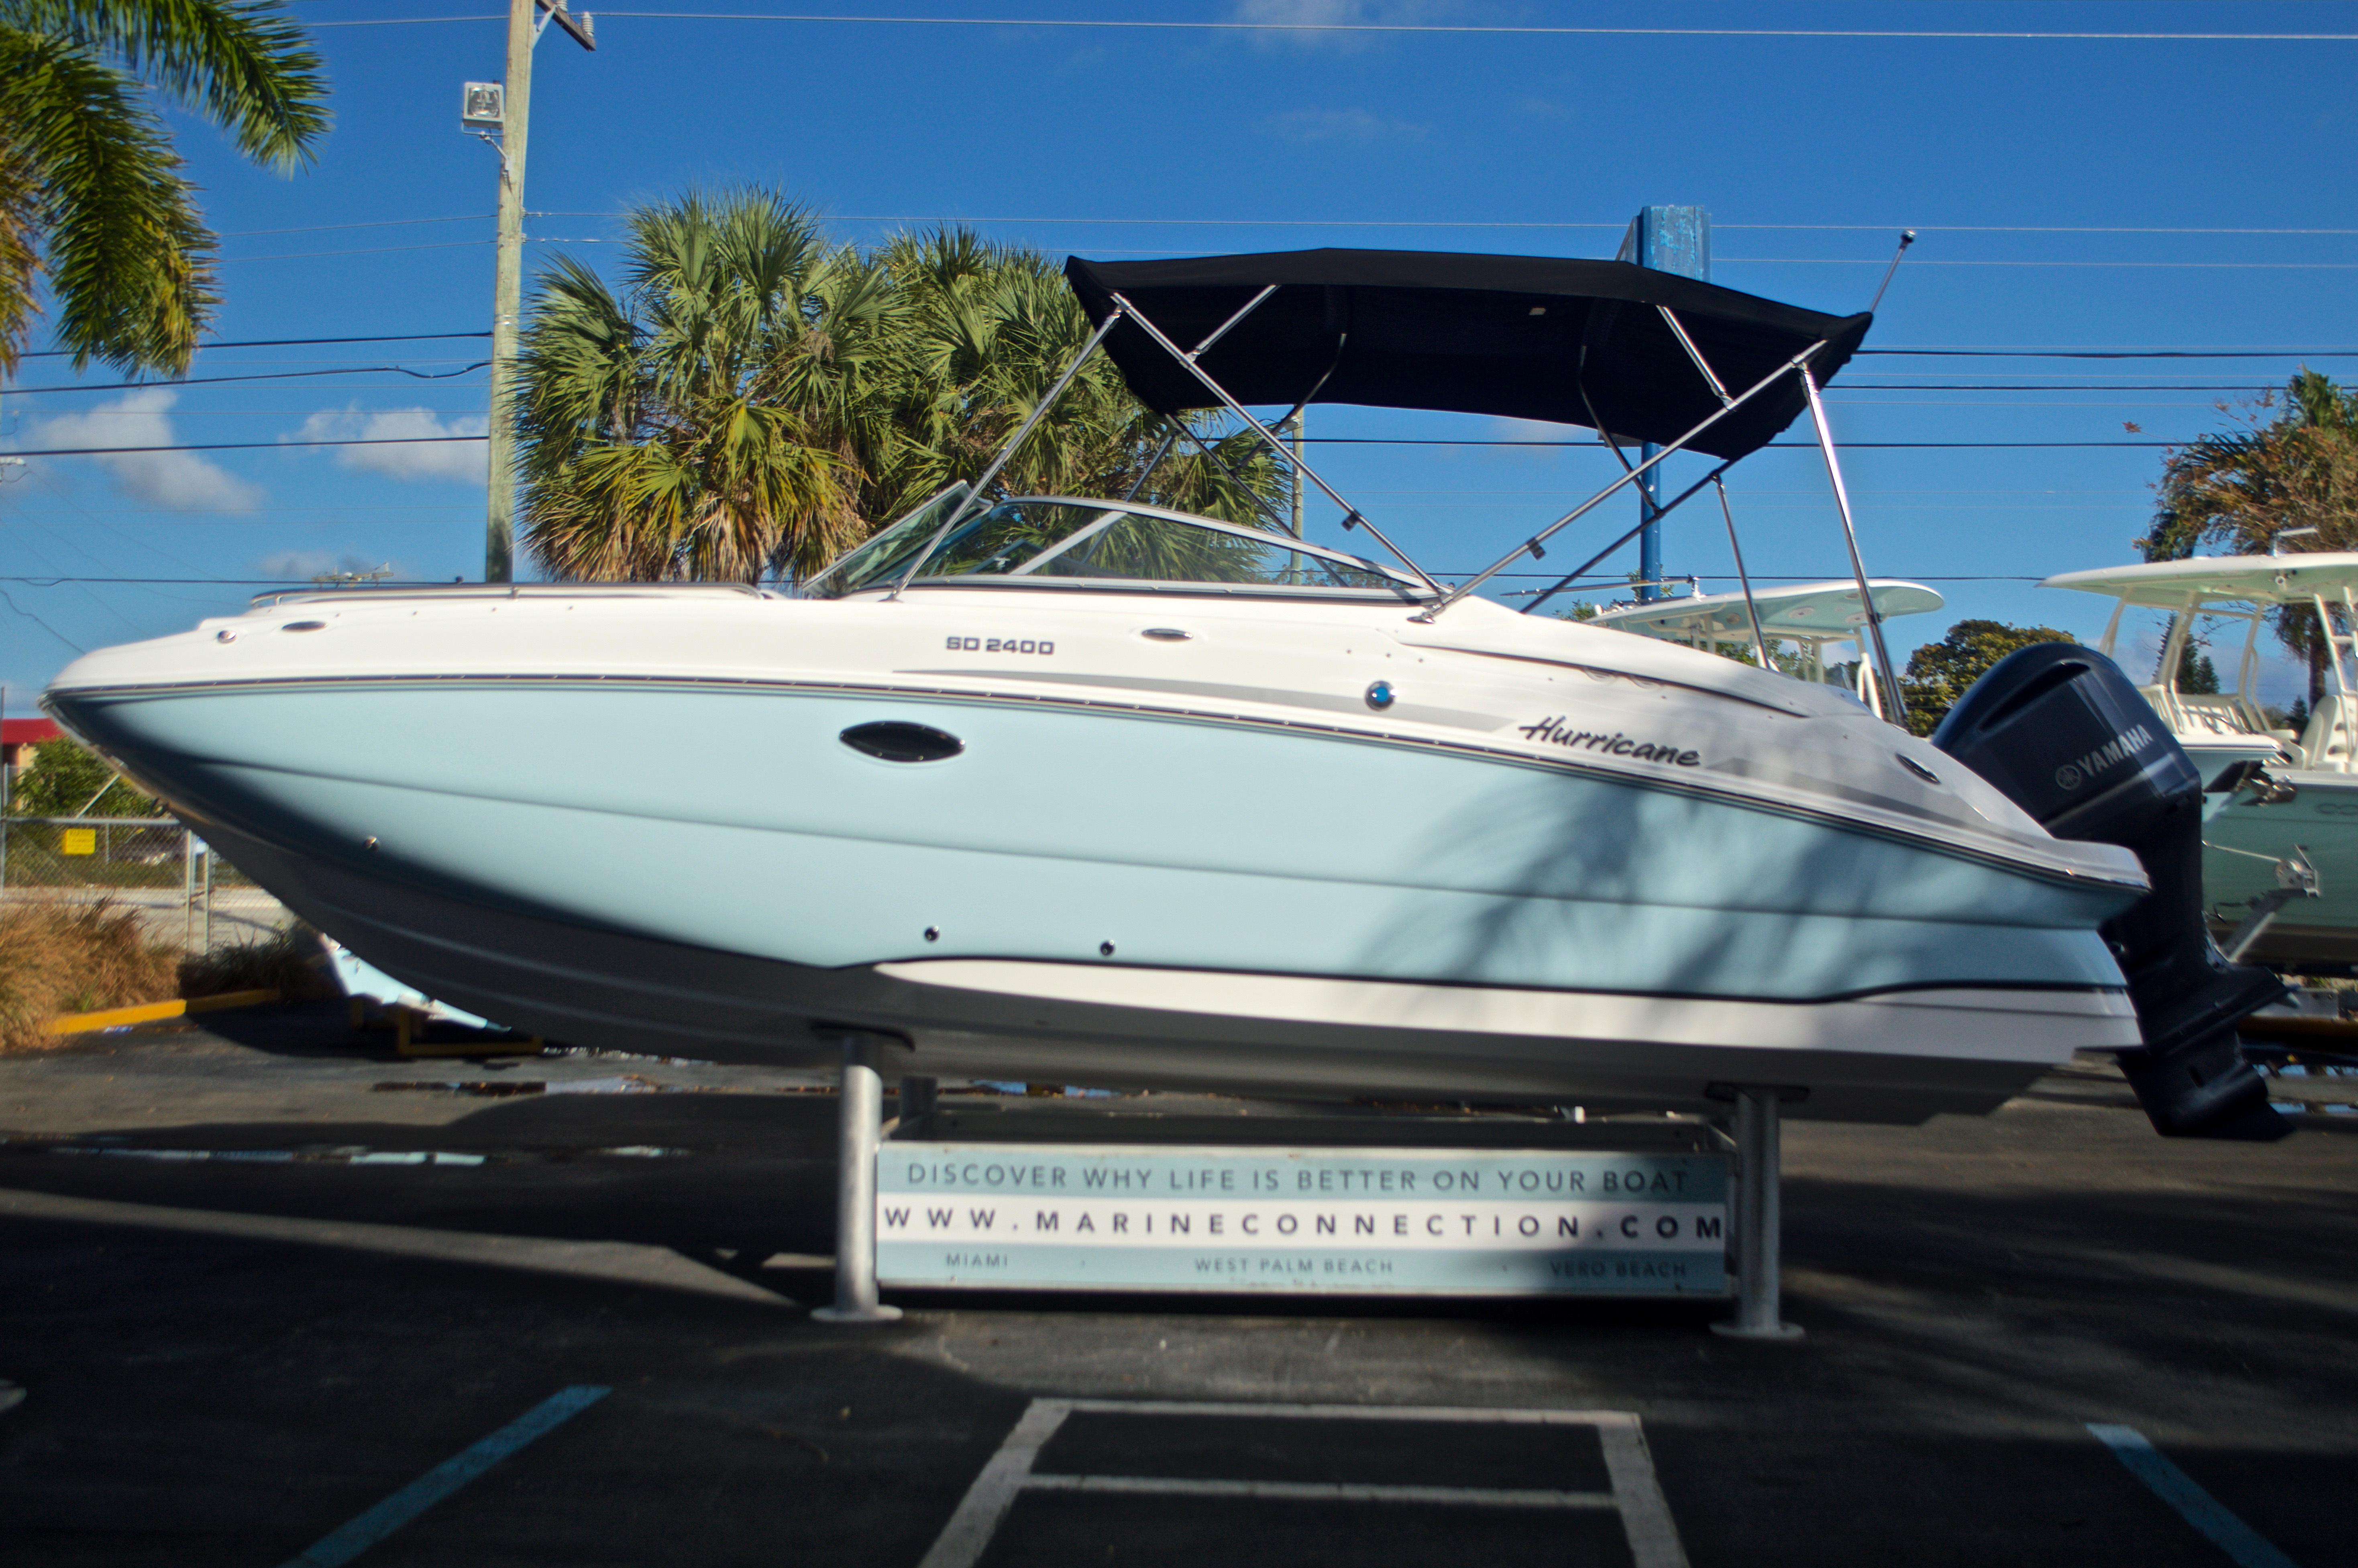 Thumbnail 4 for New 2017 Hurricane SunDeck SD 2400 OB boat for sale in Miami, FL